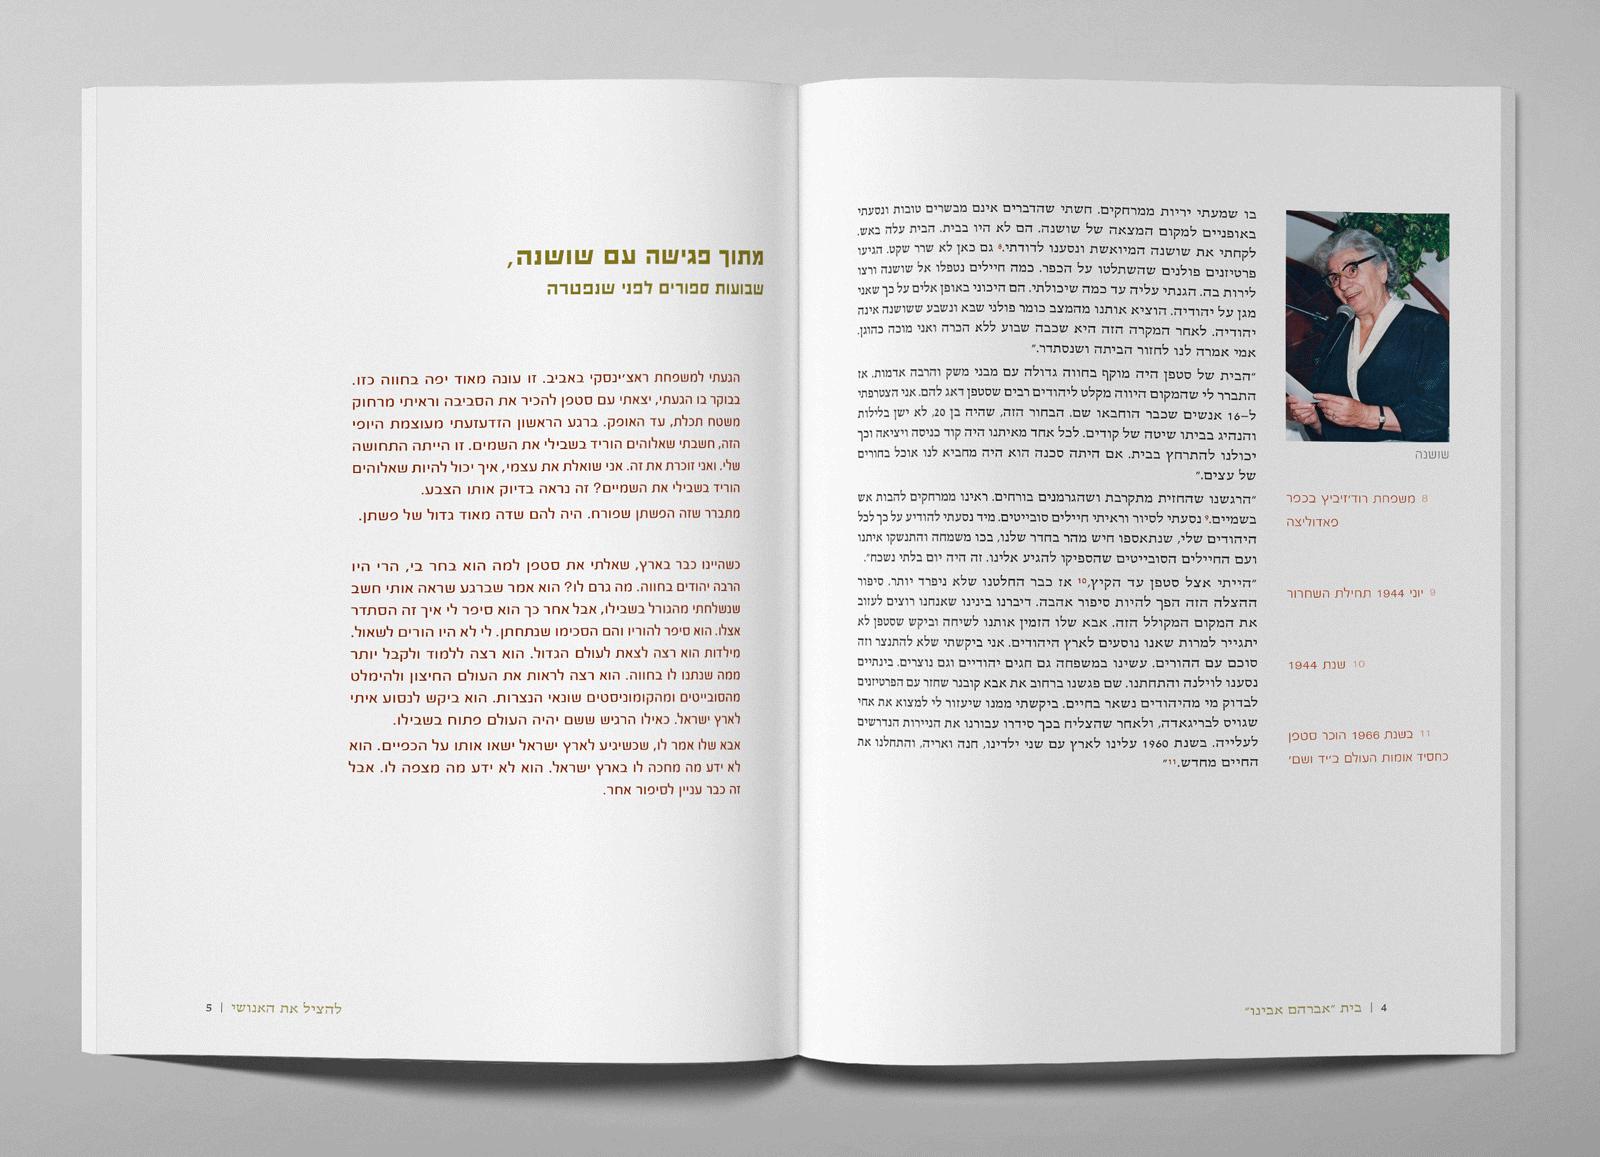 http://bigeyes.co.il/wp-content/uploads/2019/08/hasidim-3.png